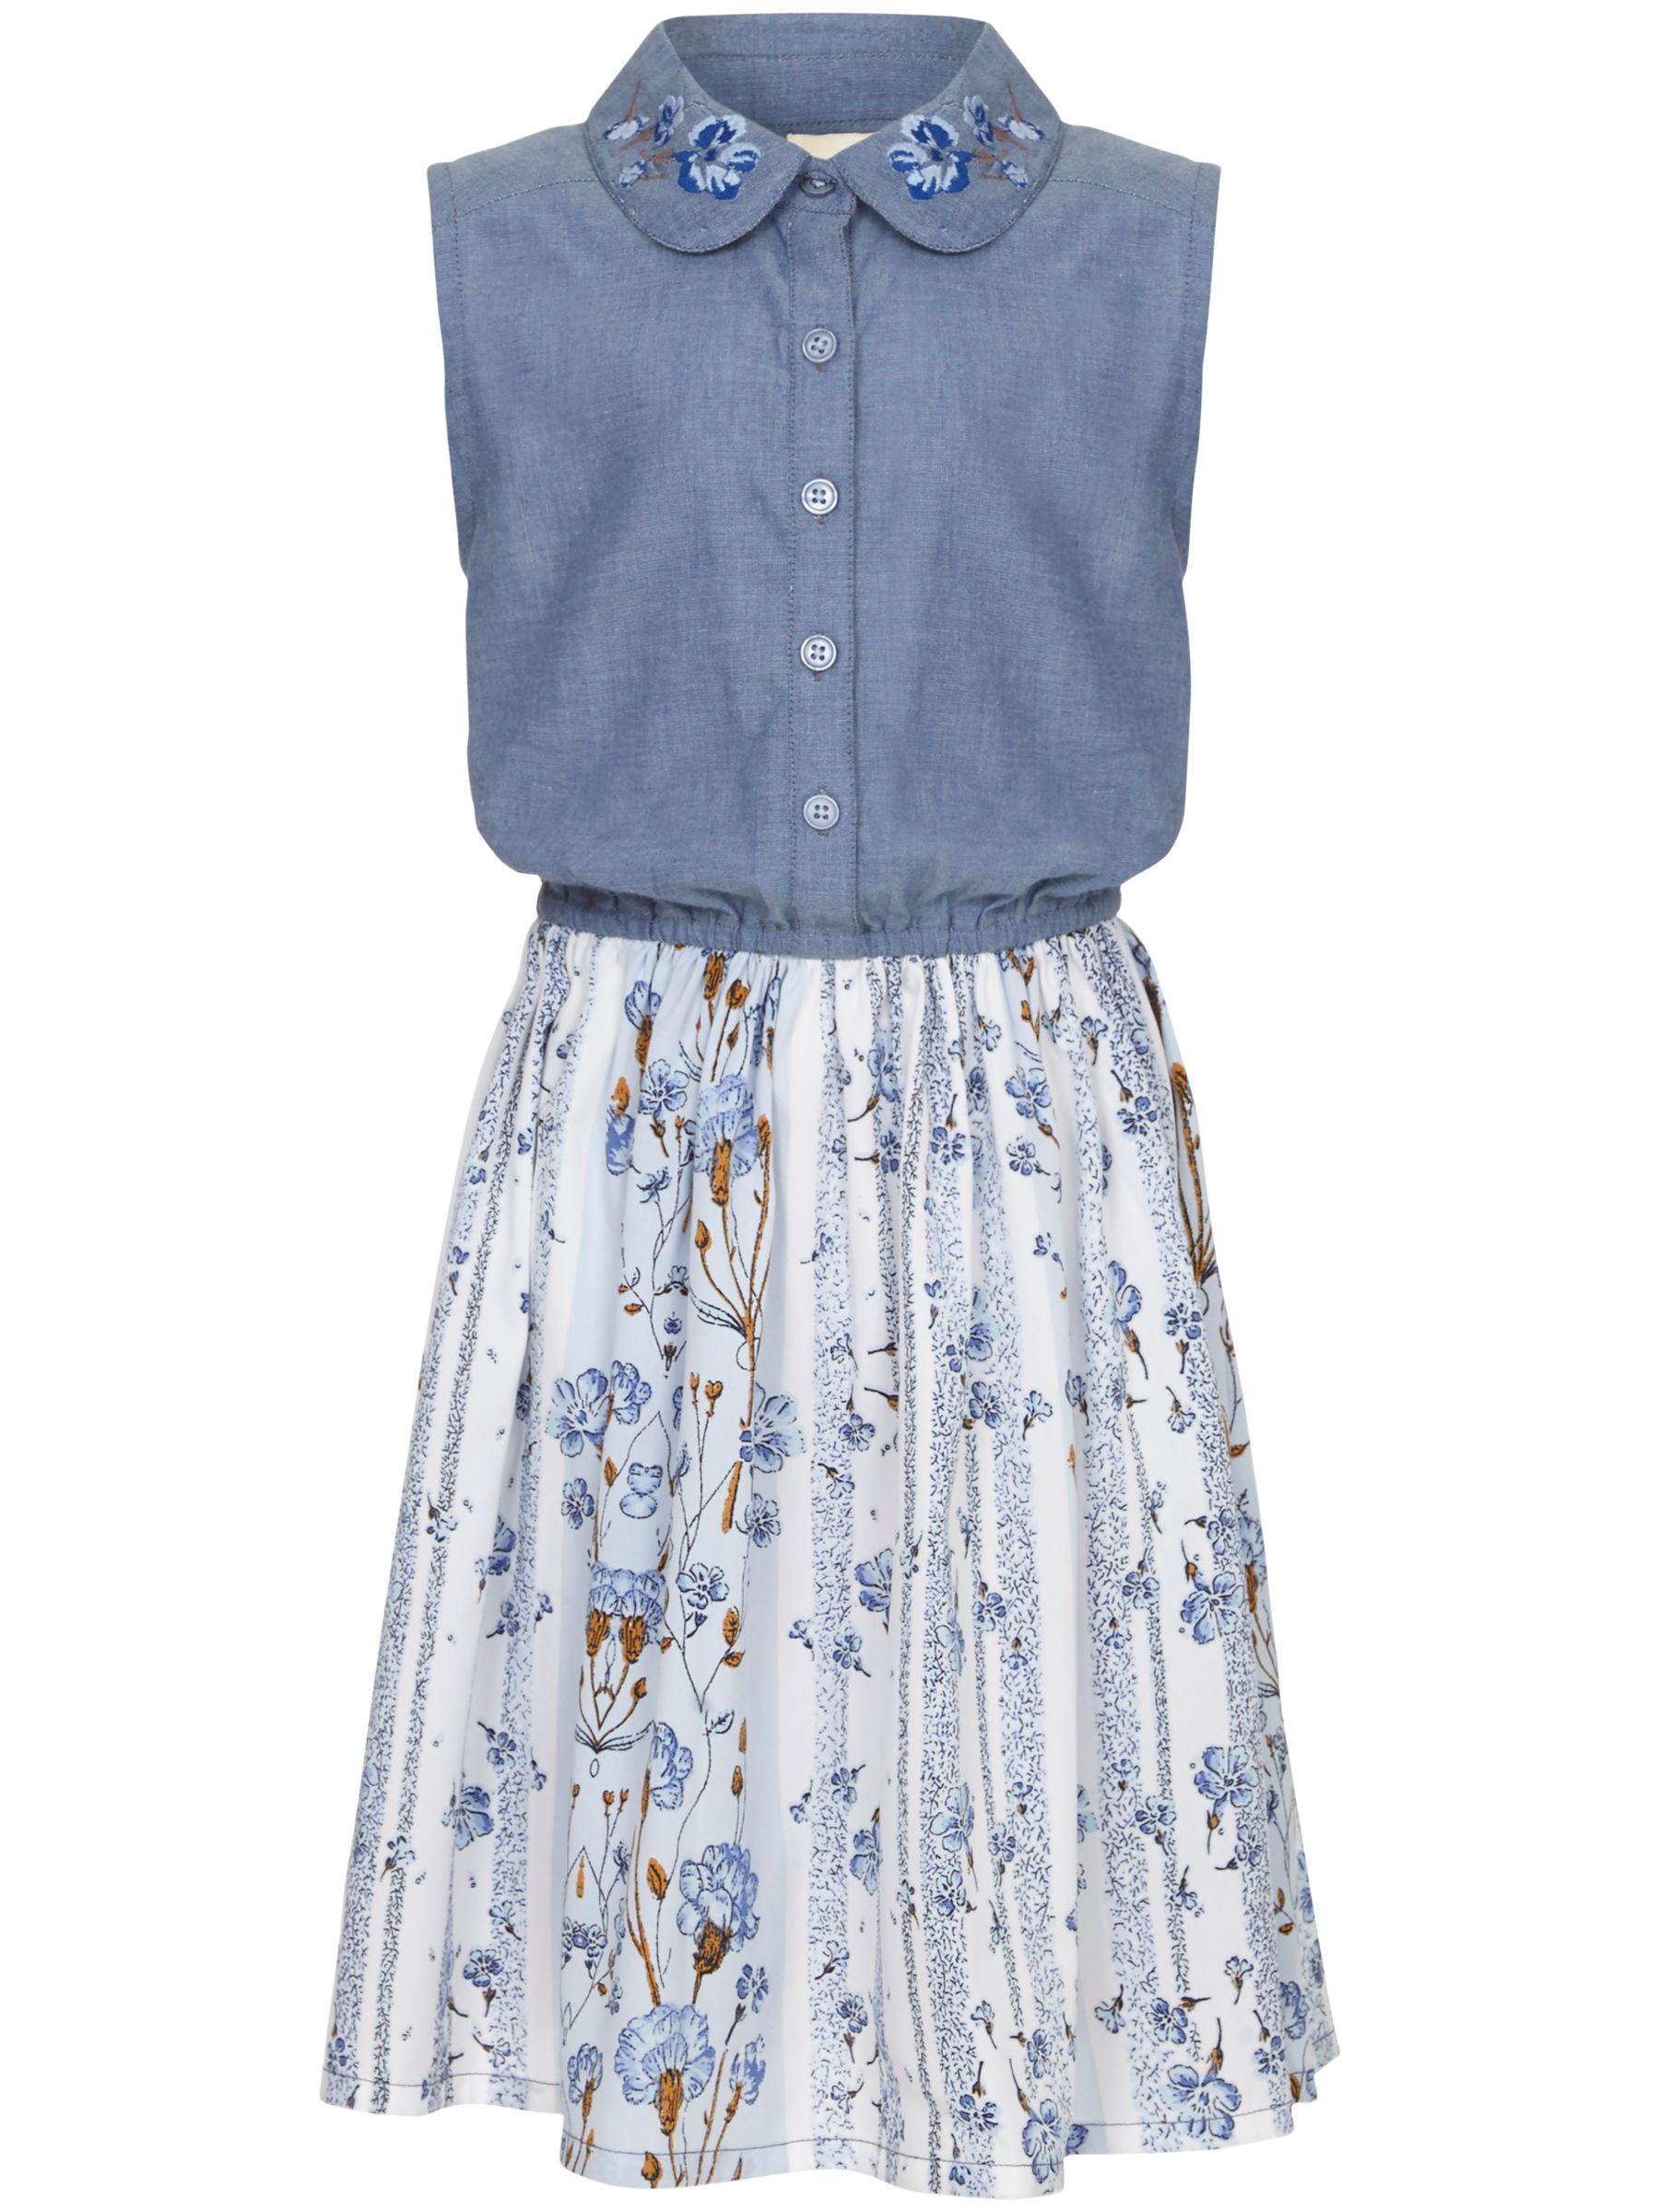 Yumi Yumi Girl Floral Chambray Dress, Blue